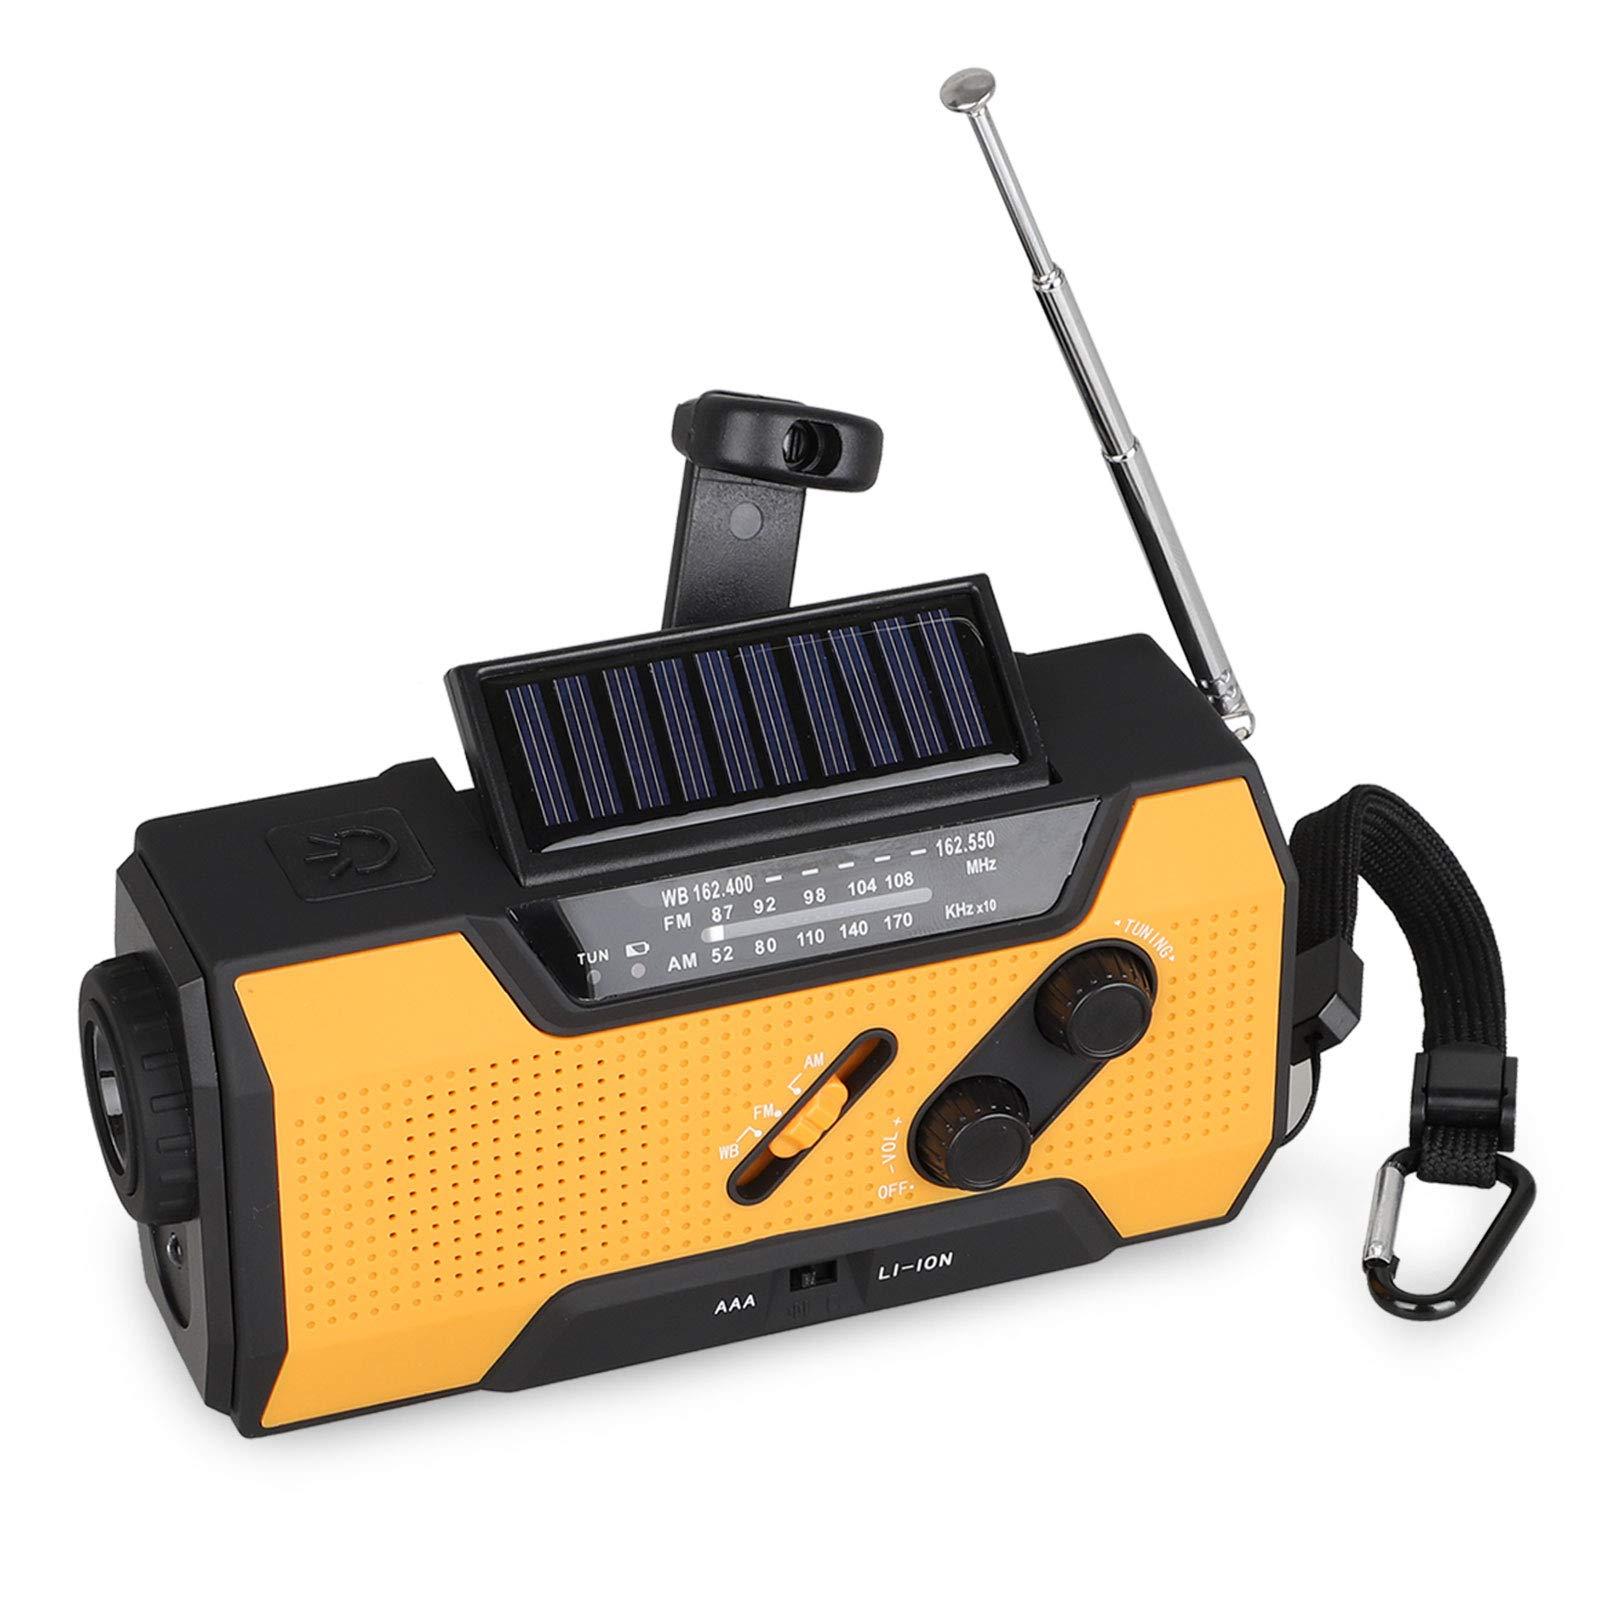 EEEKit Emergency Radios, Hand Crank Radio Weather Radios Solar Self Powered AM/FM Radio with 2000mAh Rechargeable Battery, Flashlight and Loudly Alarm